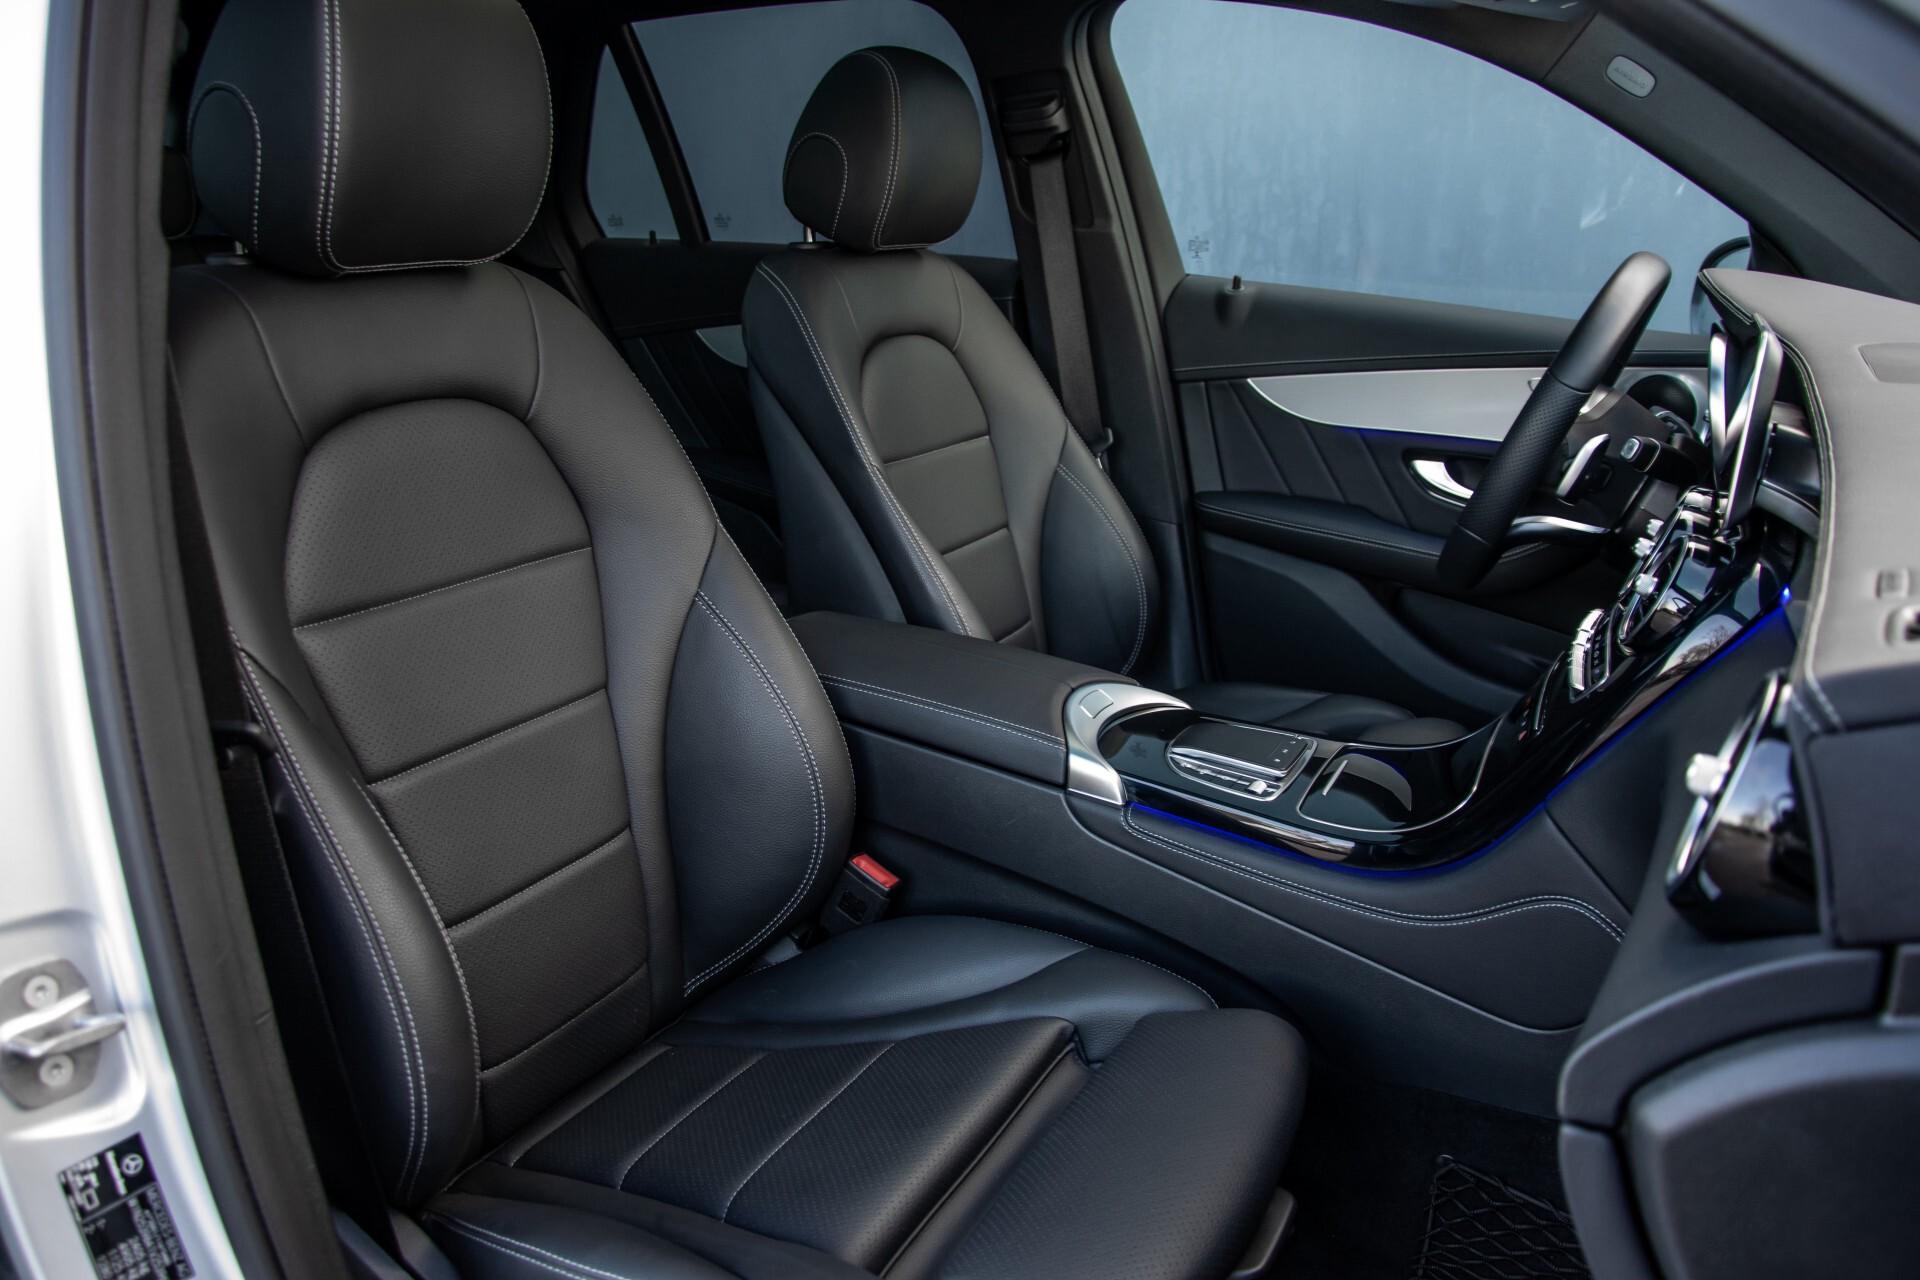 Mercedes-Benz GLC 300 4-M AMG Panorama/Keyless/Assistentiepakket/MBUX//Wegkl-trekhaak Aut9 Foto 4